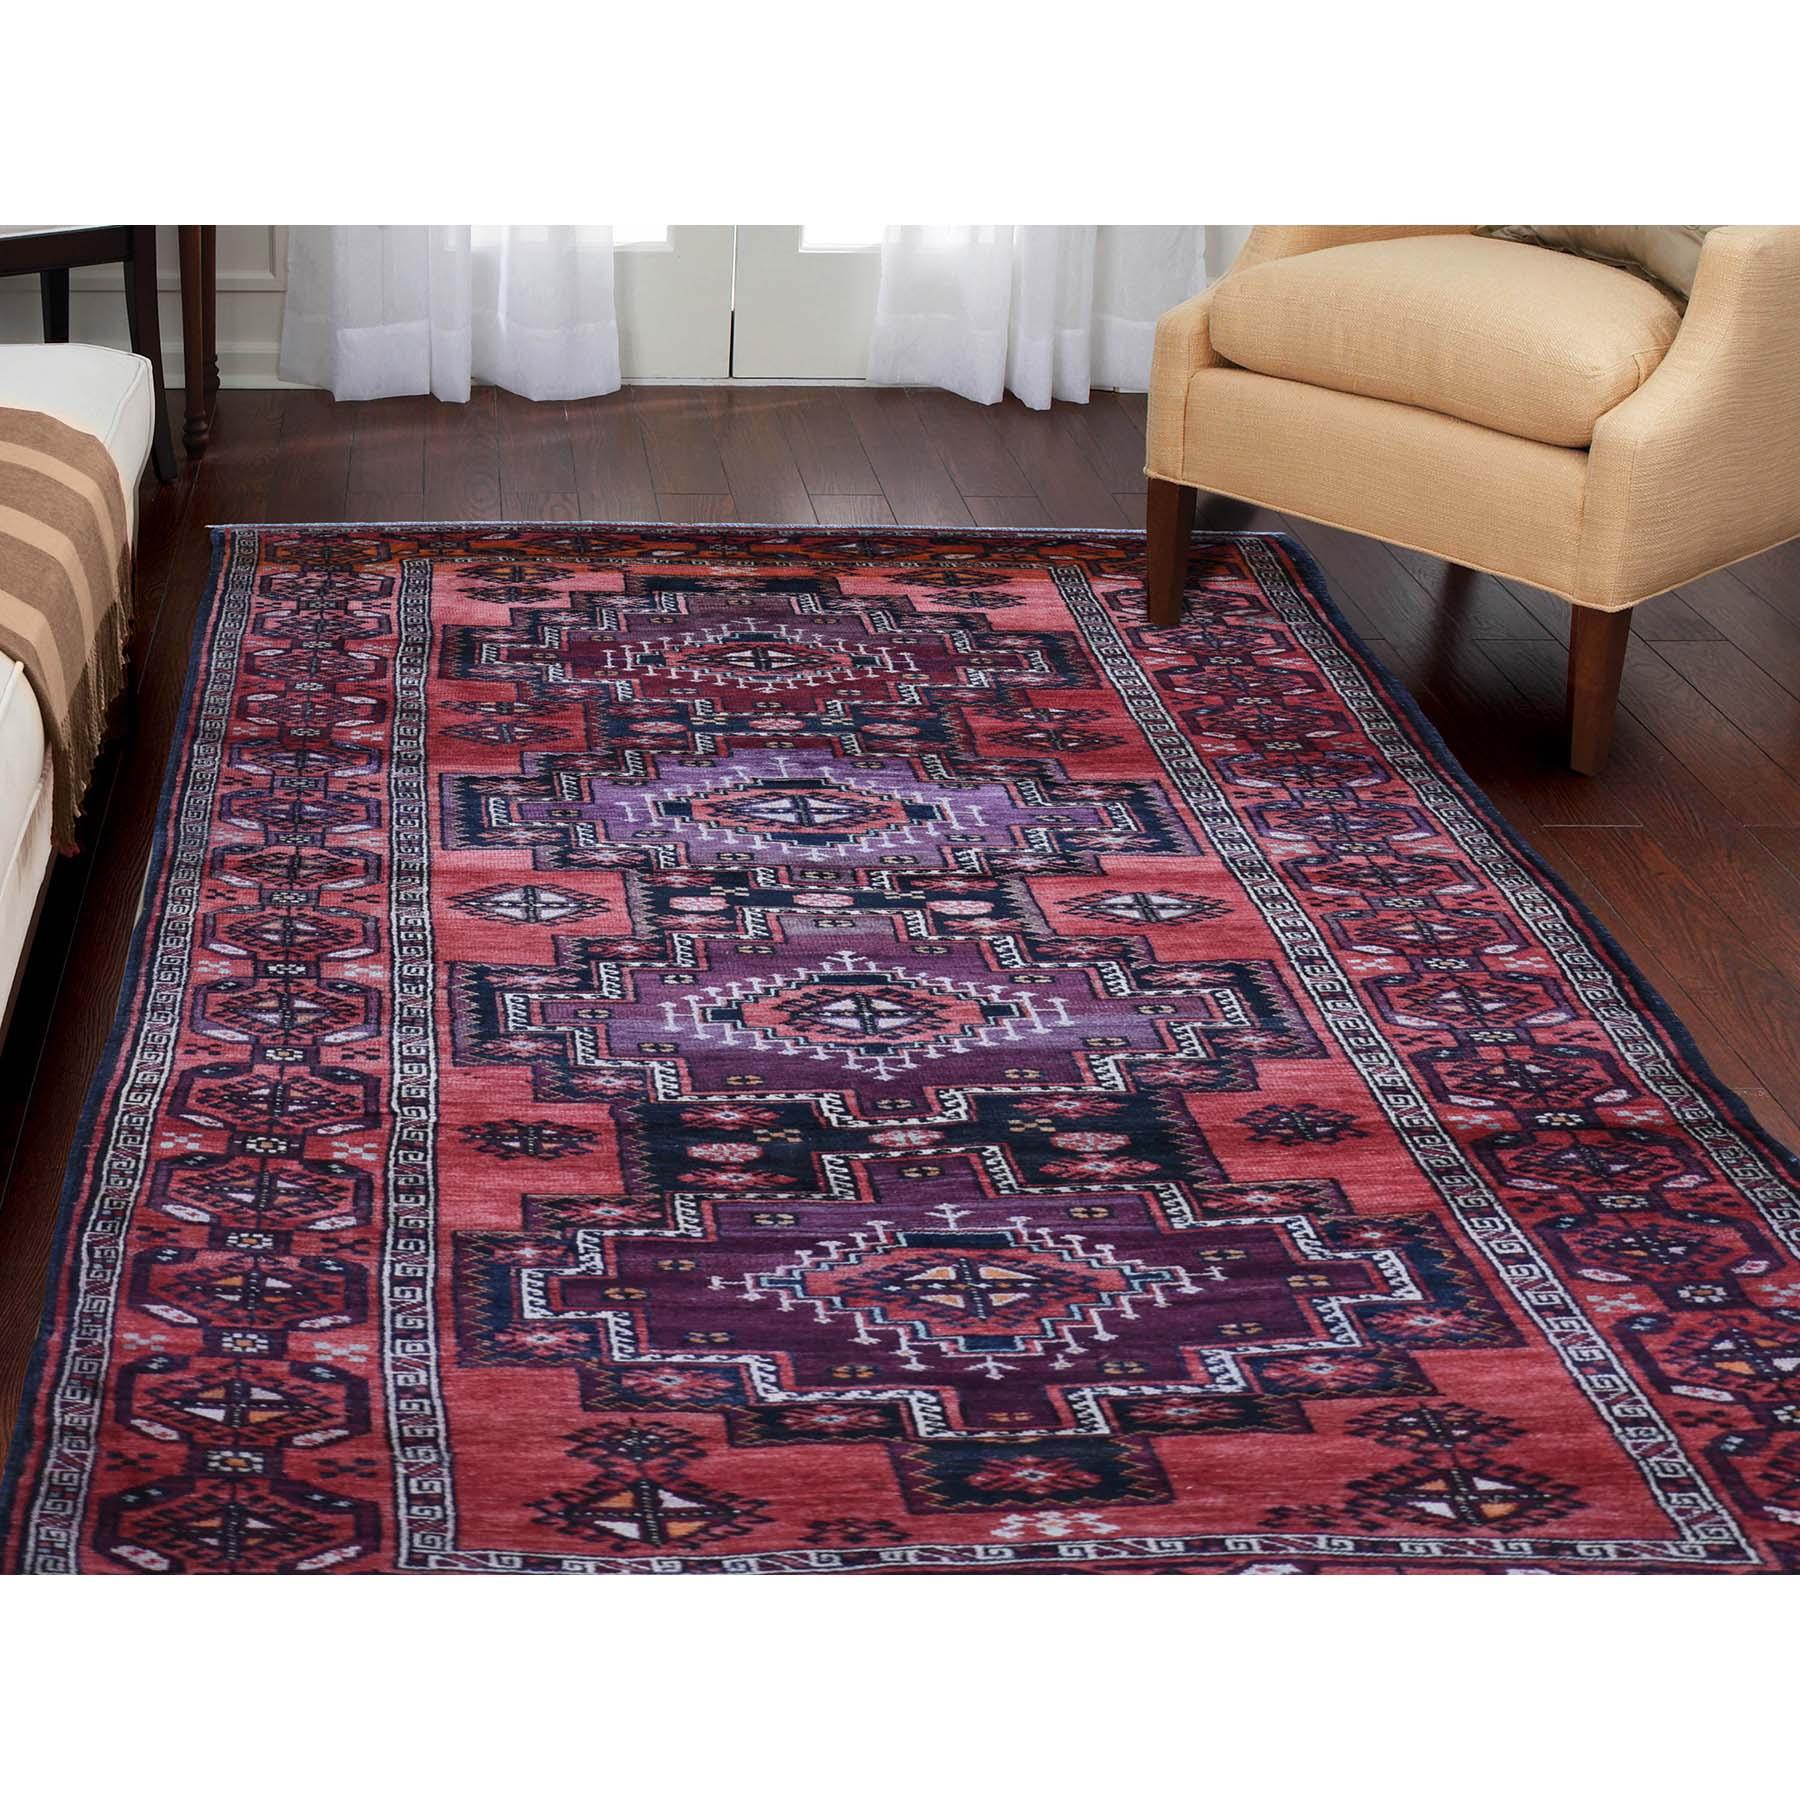 5-x10- Pure Wool Wide Runner Semi Antique Turkoman Village Hand-Knotted Oriental Rug